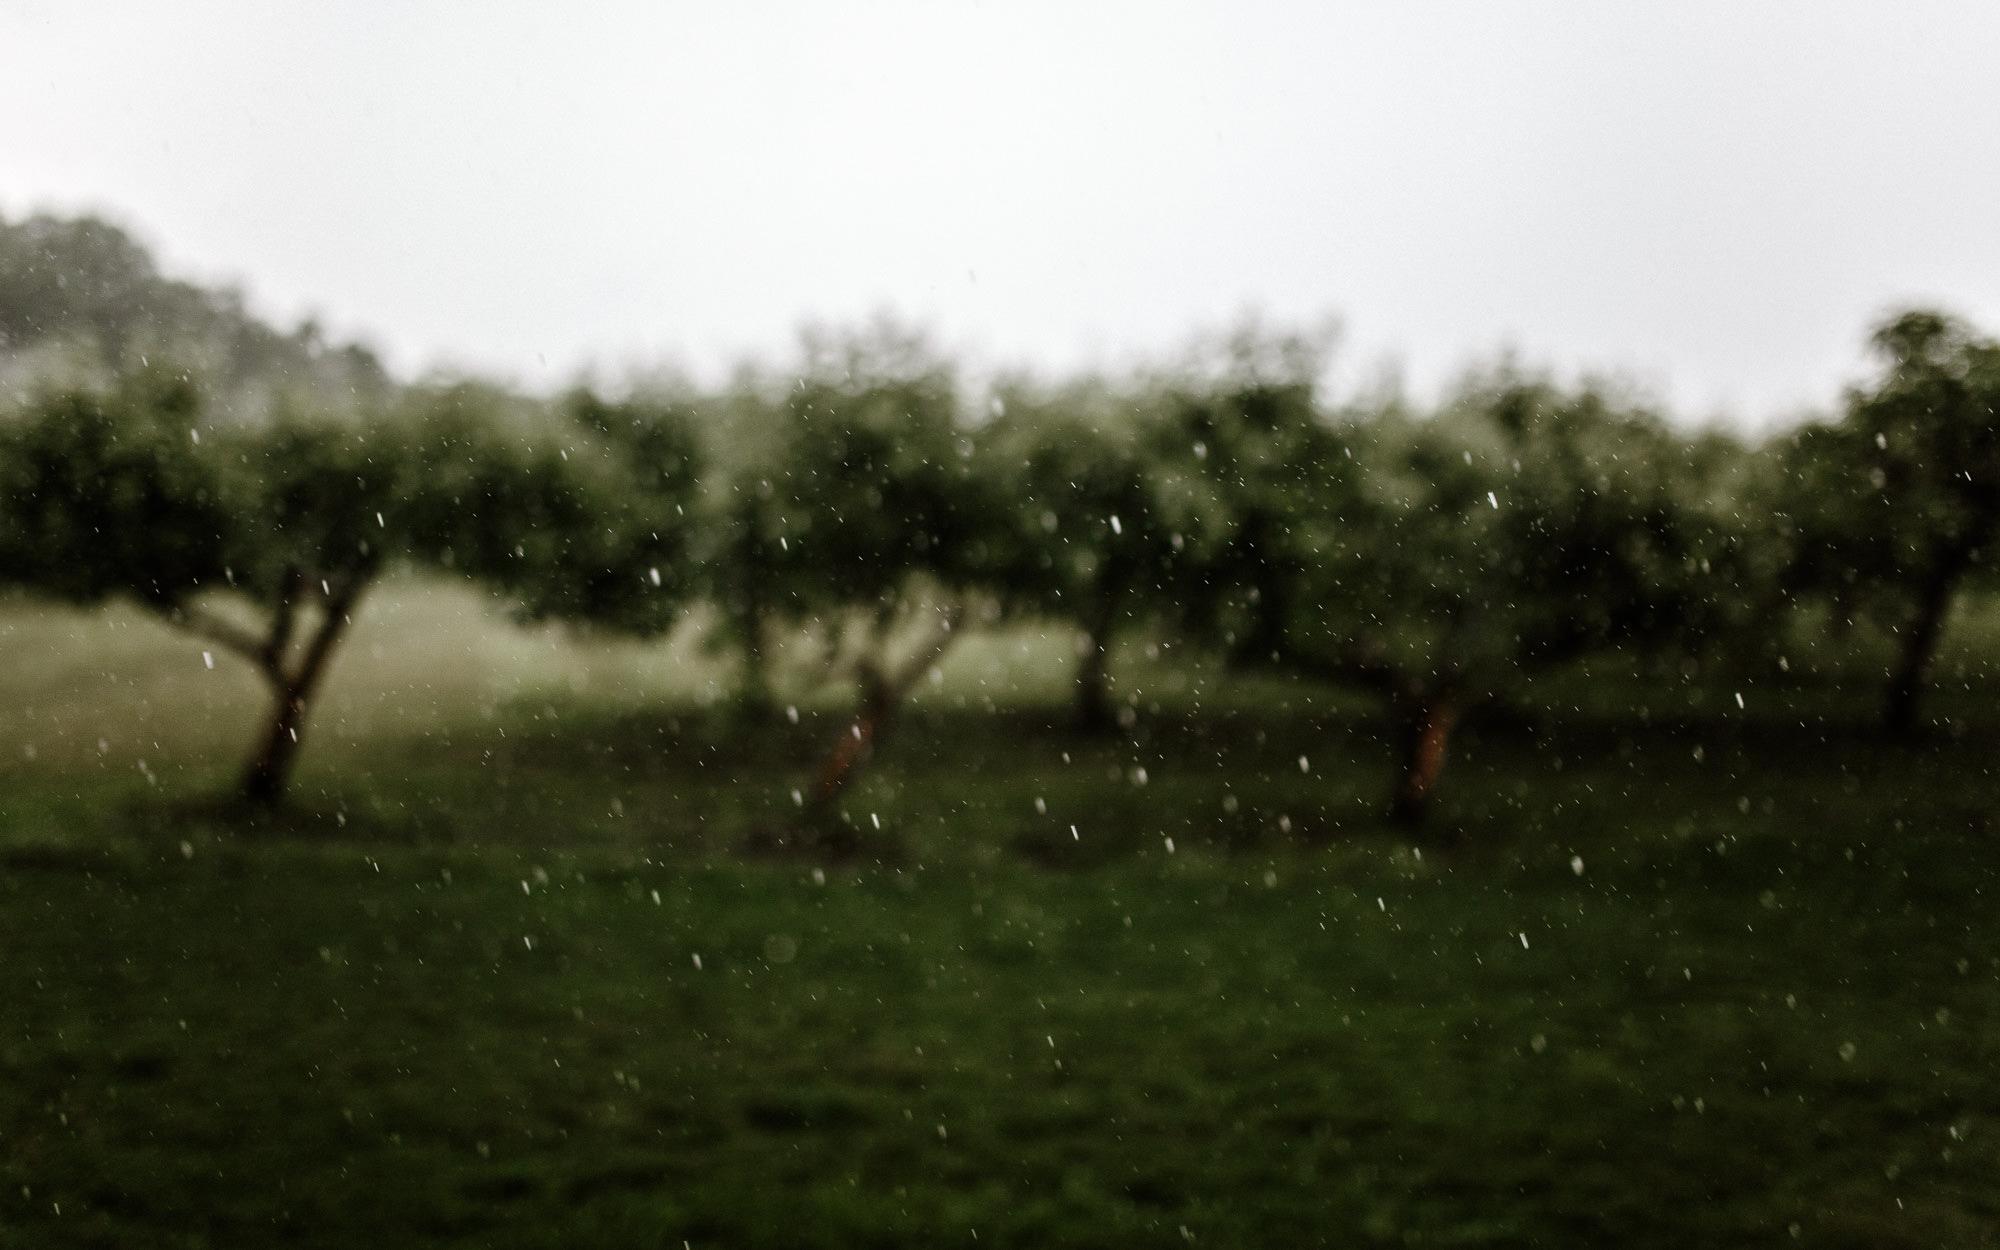 meadow-barn-wedding-sioux-falls-south-dakota-romantic-adventerous-michael-liedtke-photography065.jpg